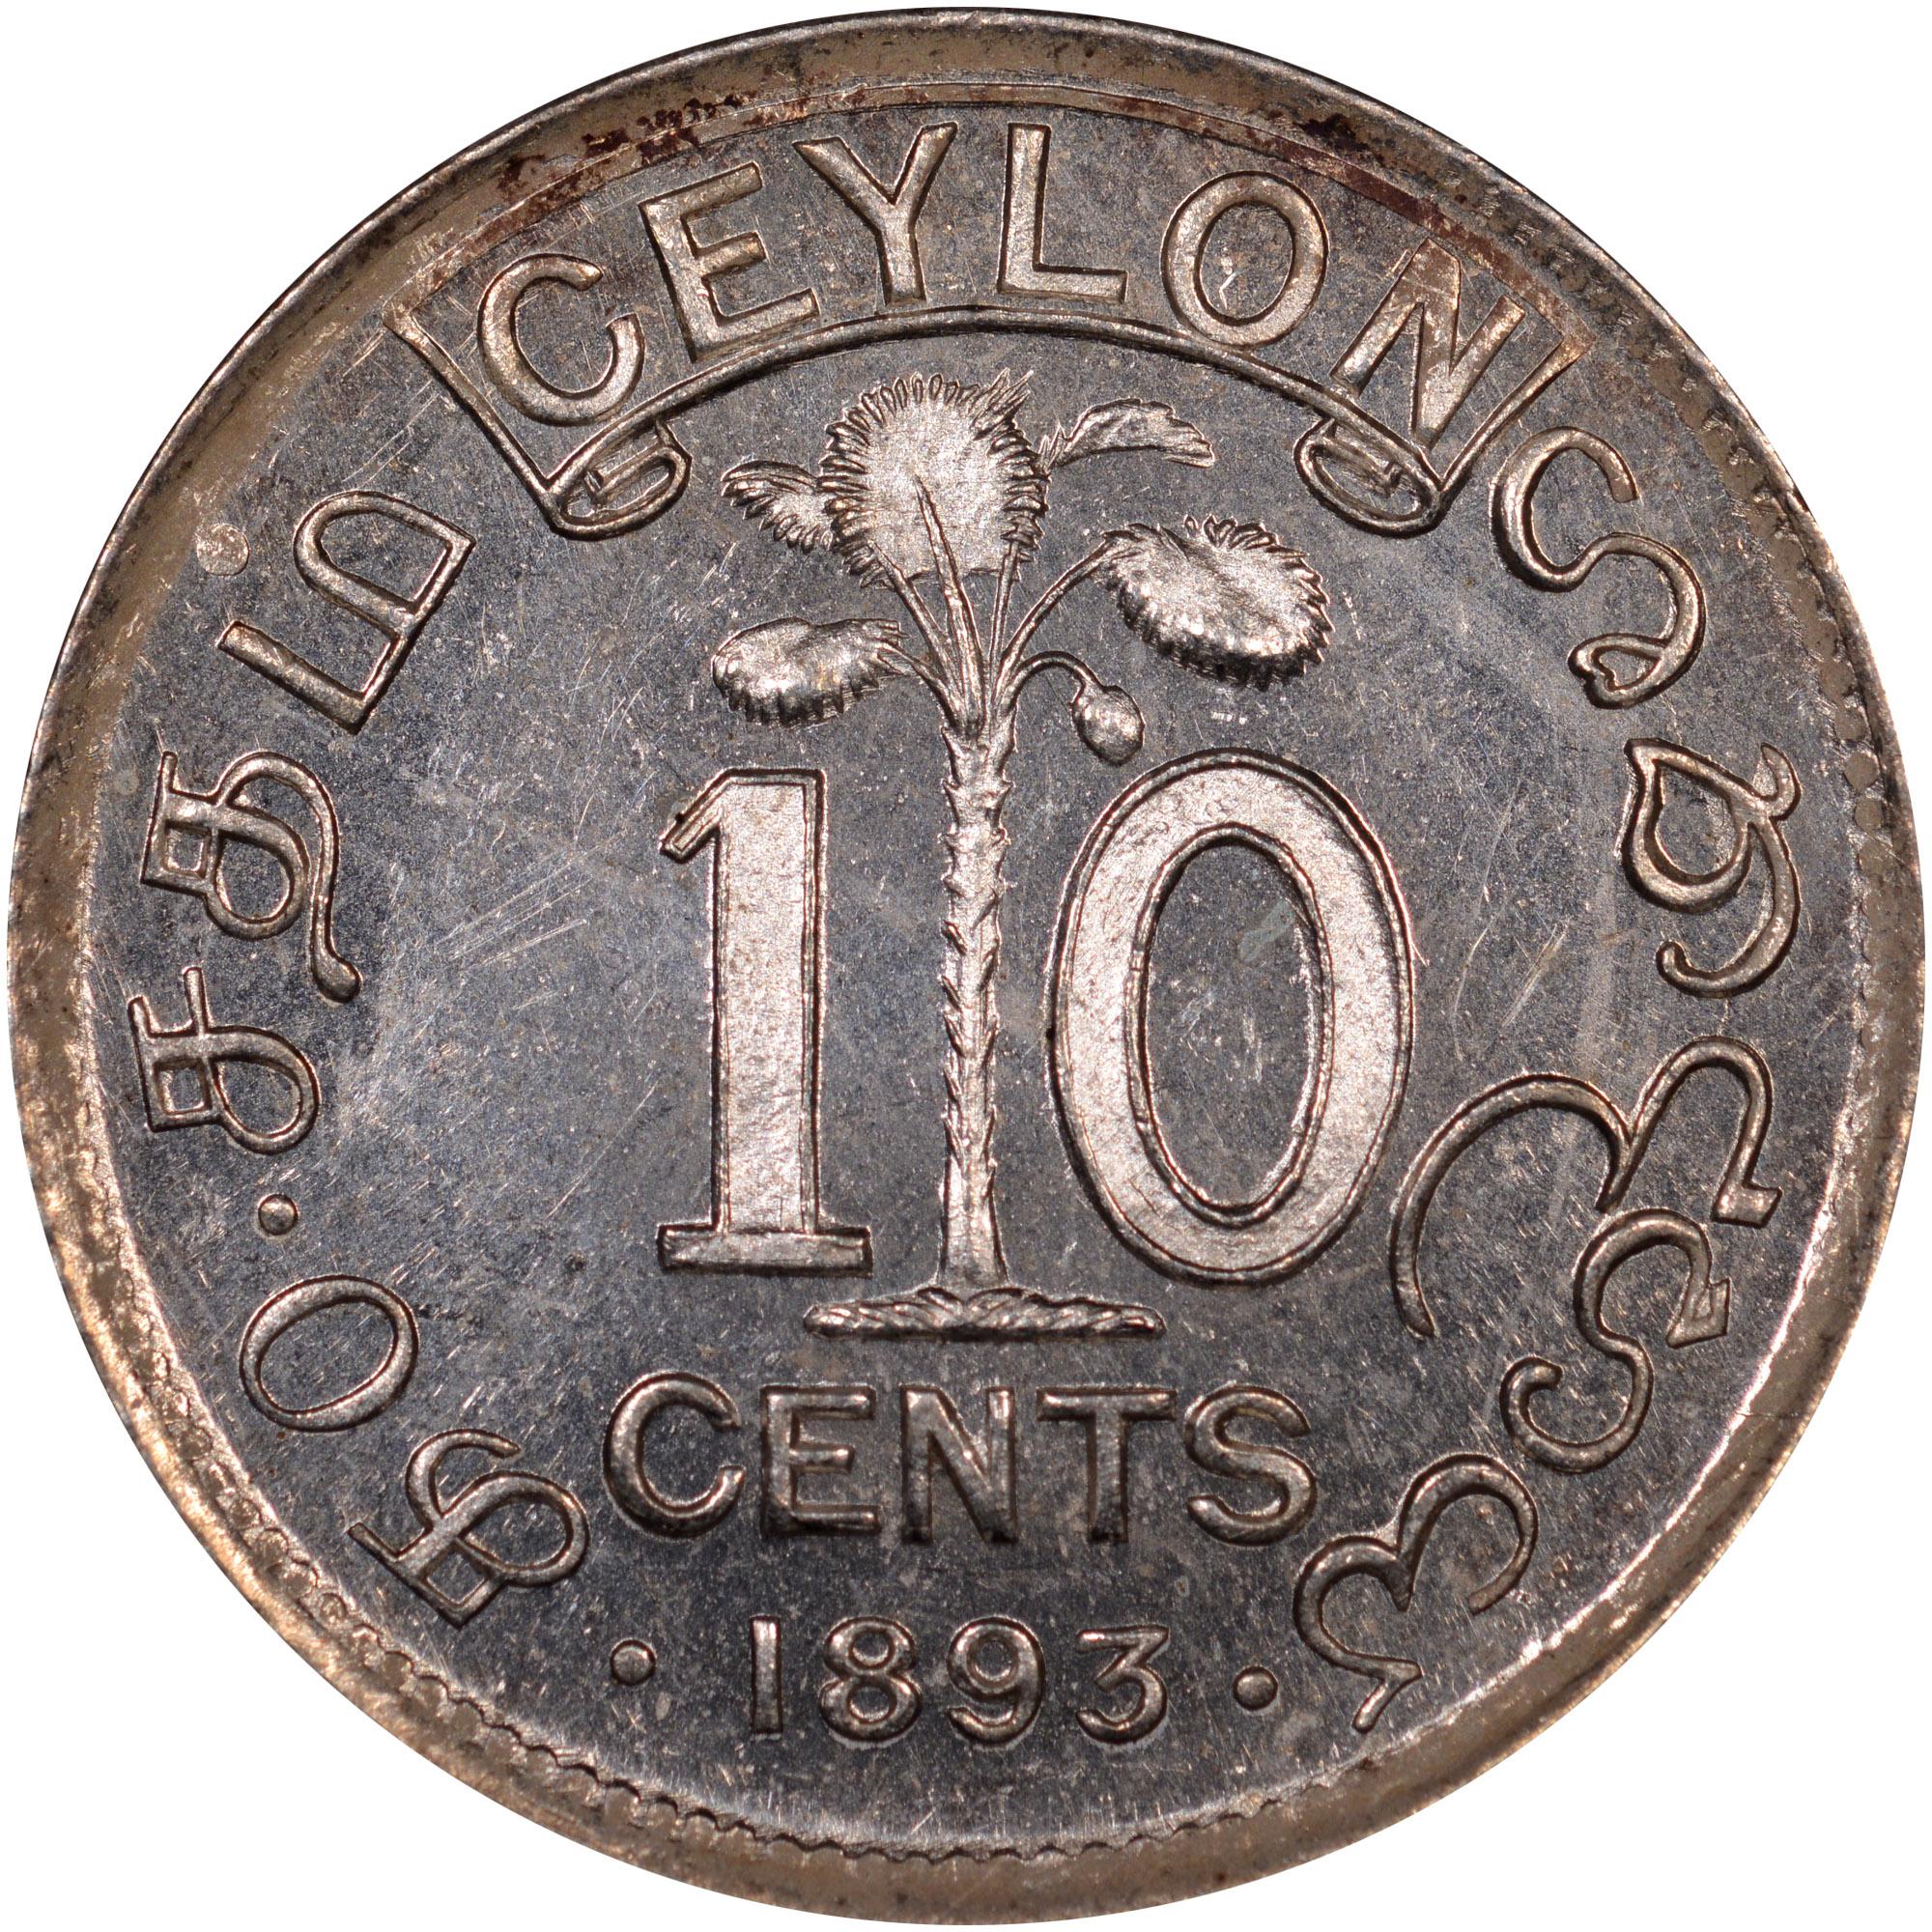 Ceylon 10 Cents reverse